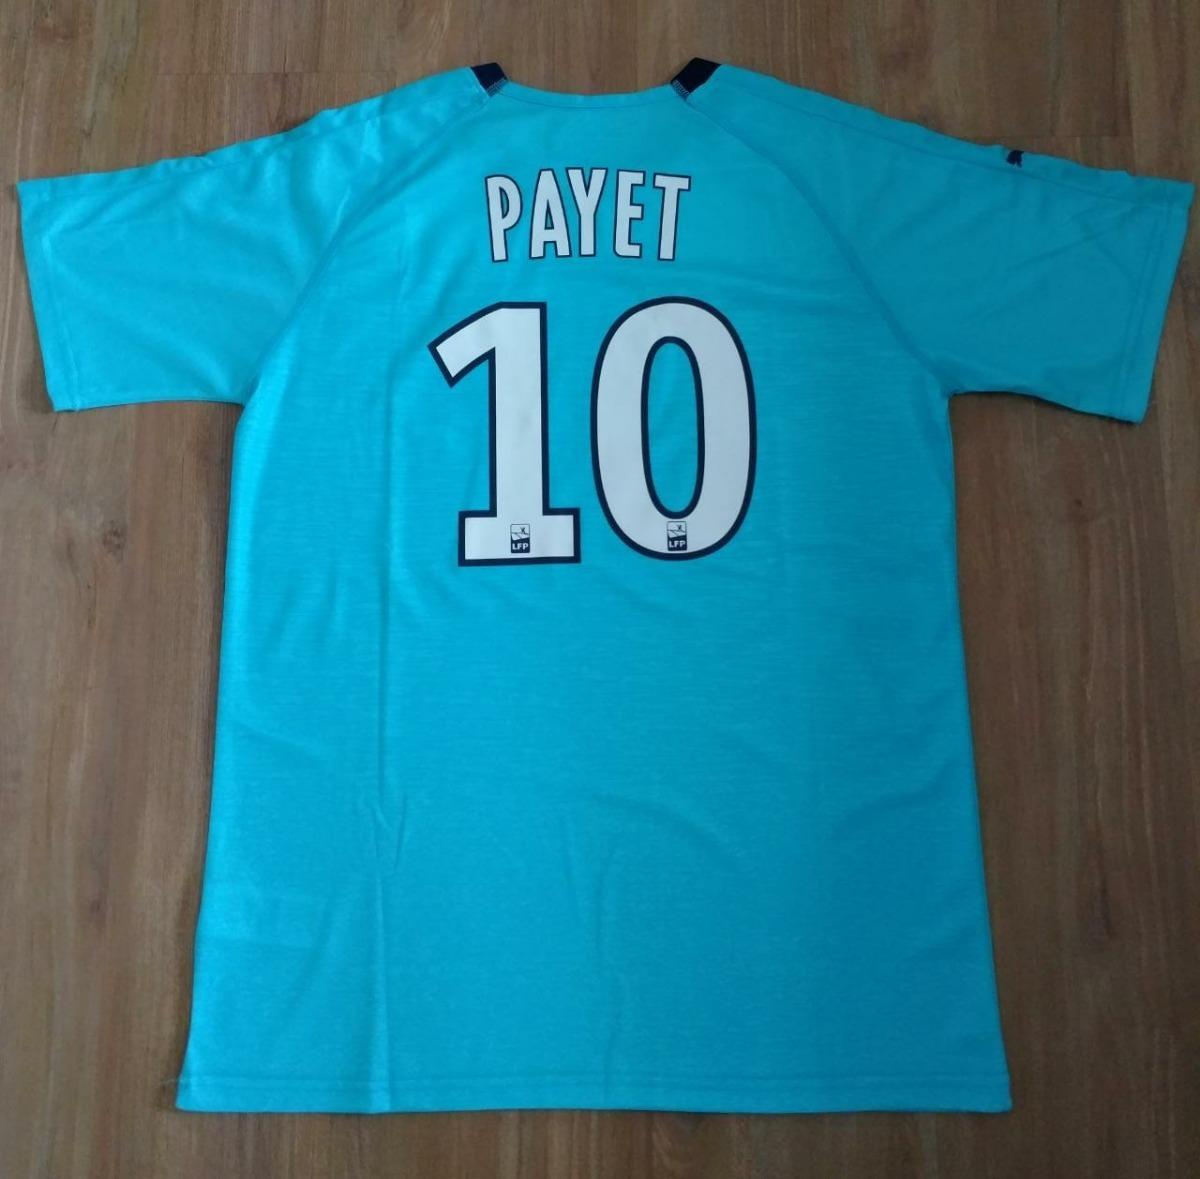 7eddeedbd Camisa Olympique De Marseille 18 19 Payet 10 Pronta Entrega - R  179 ...